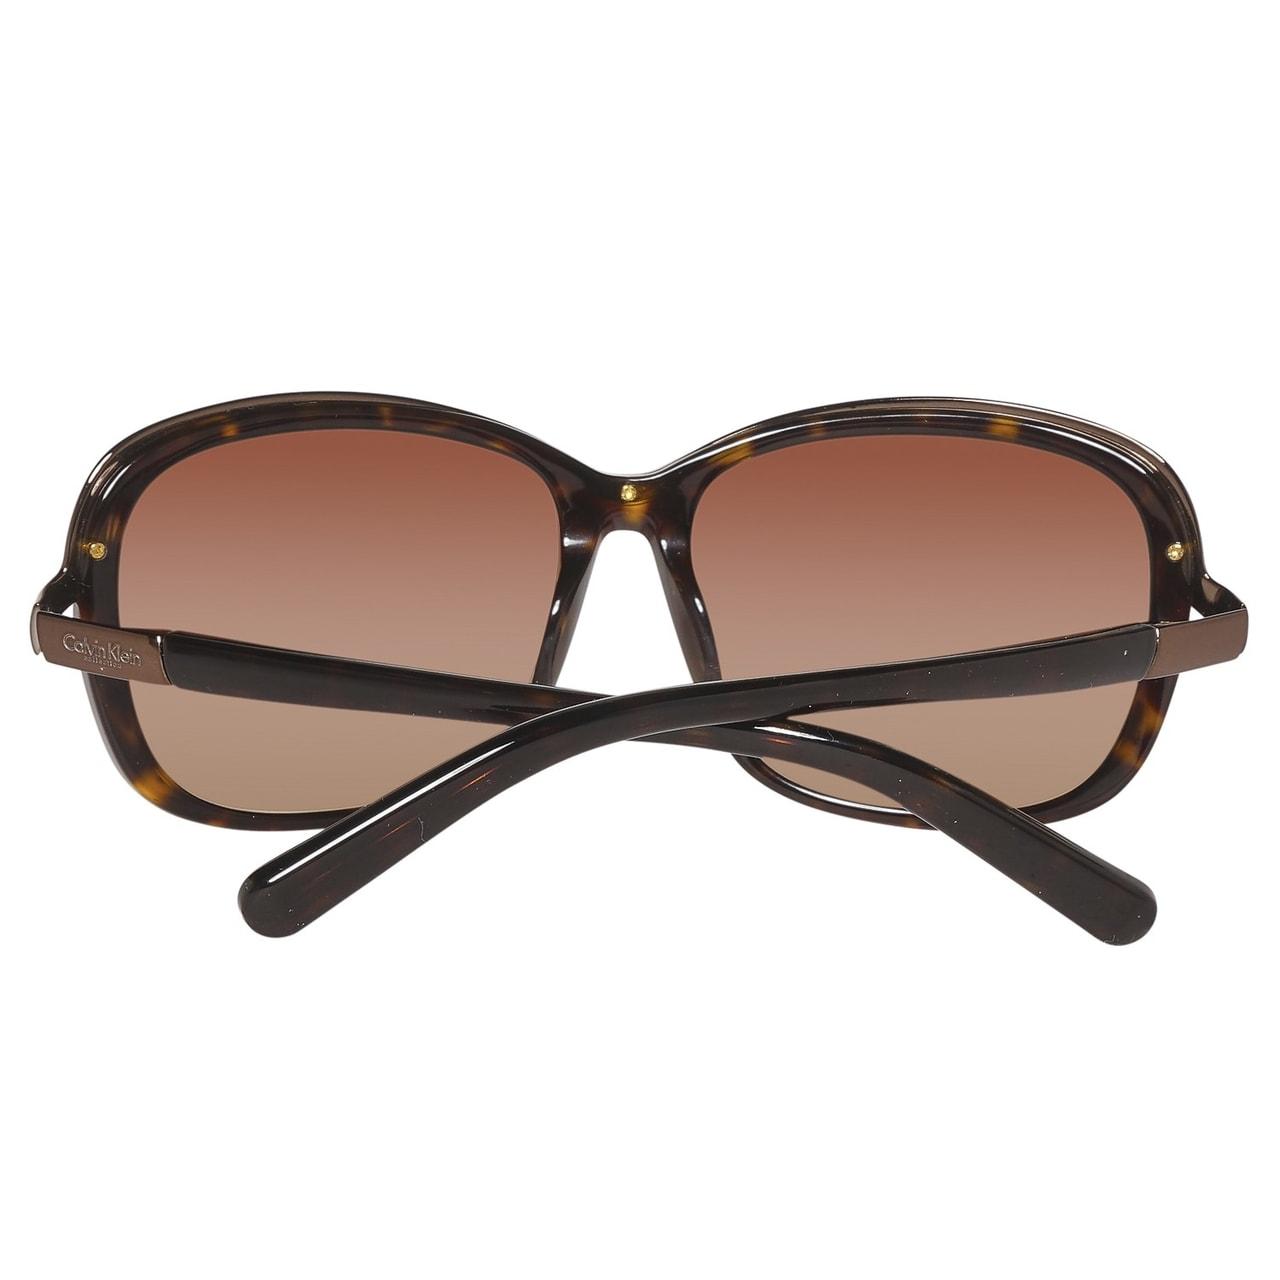 Glamadise.hu Fashion paradise - Női napszemüveg Calvin Klein - Barna ... f86d1e7458